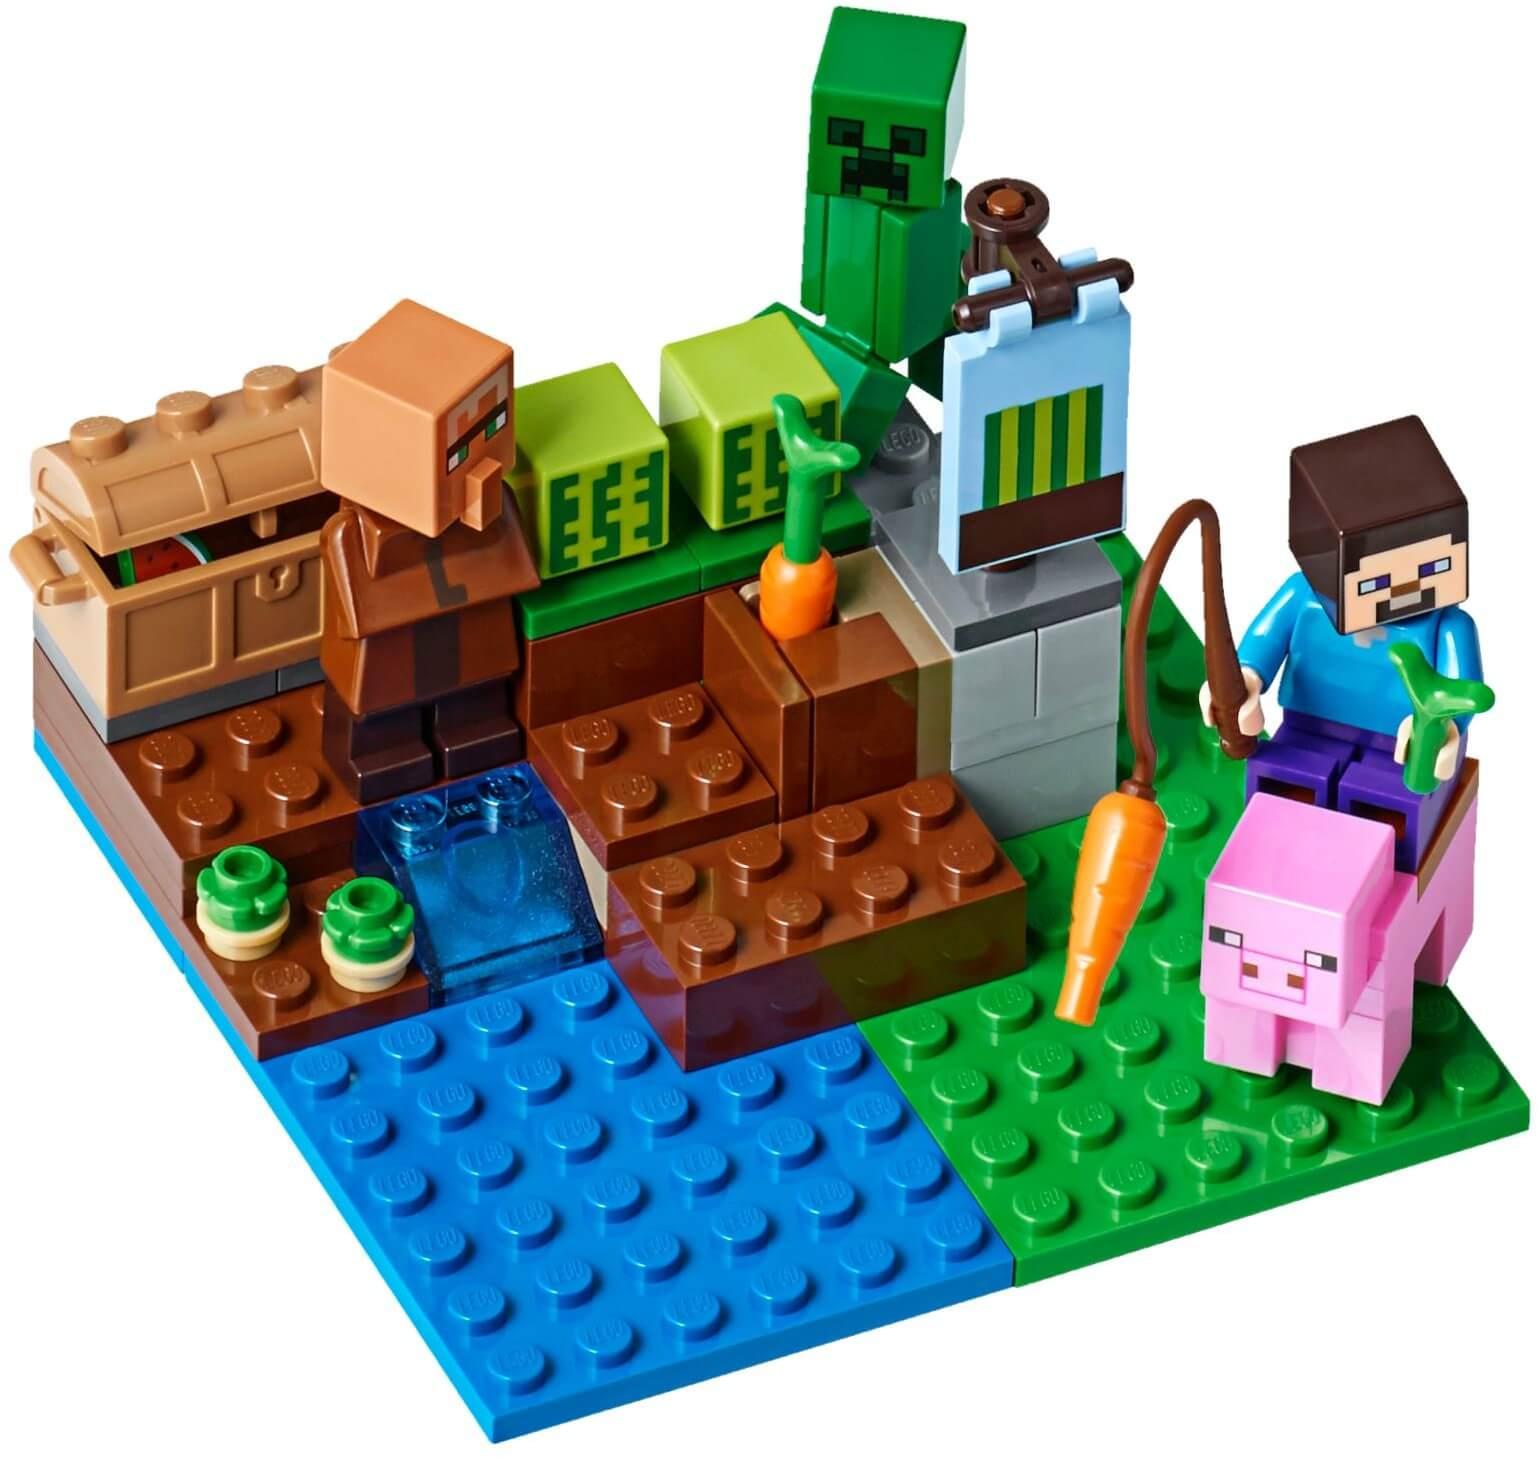 Lego khu vườn cổ tích